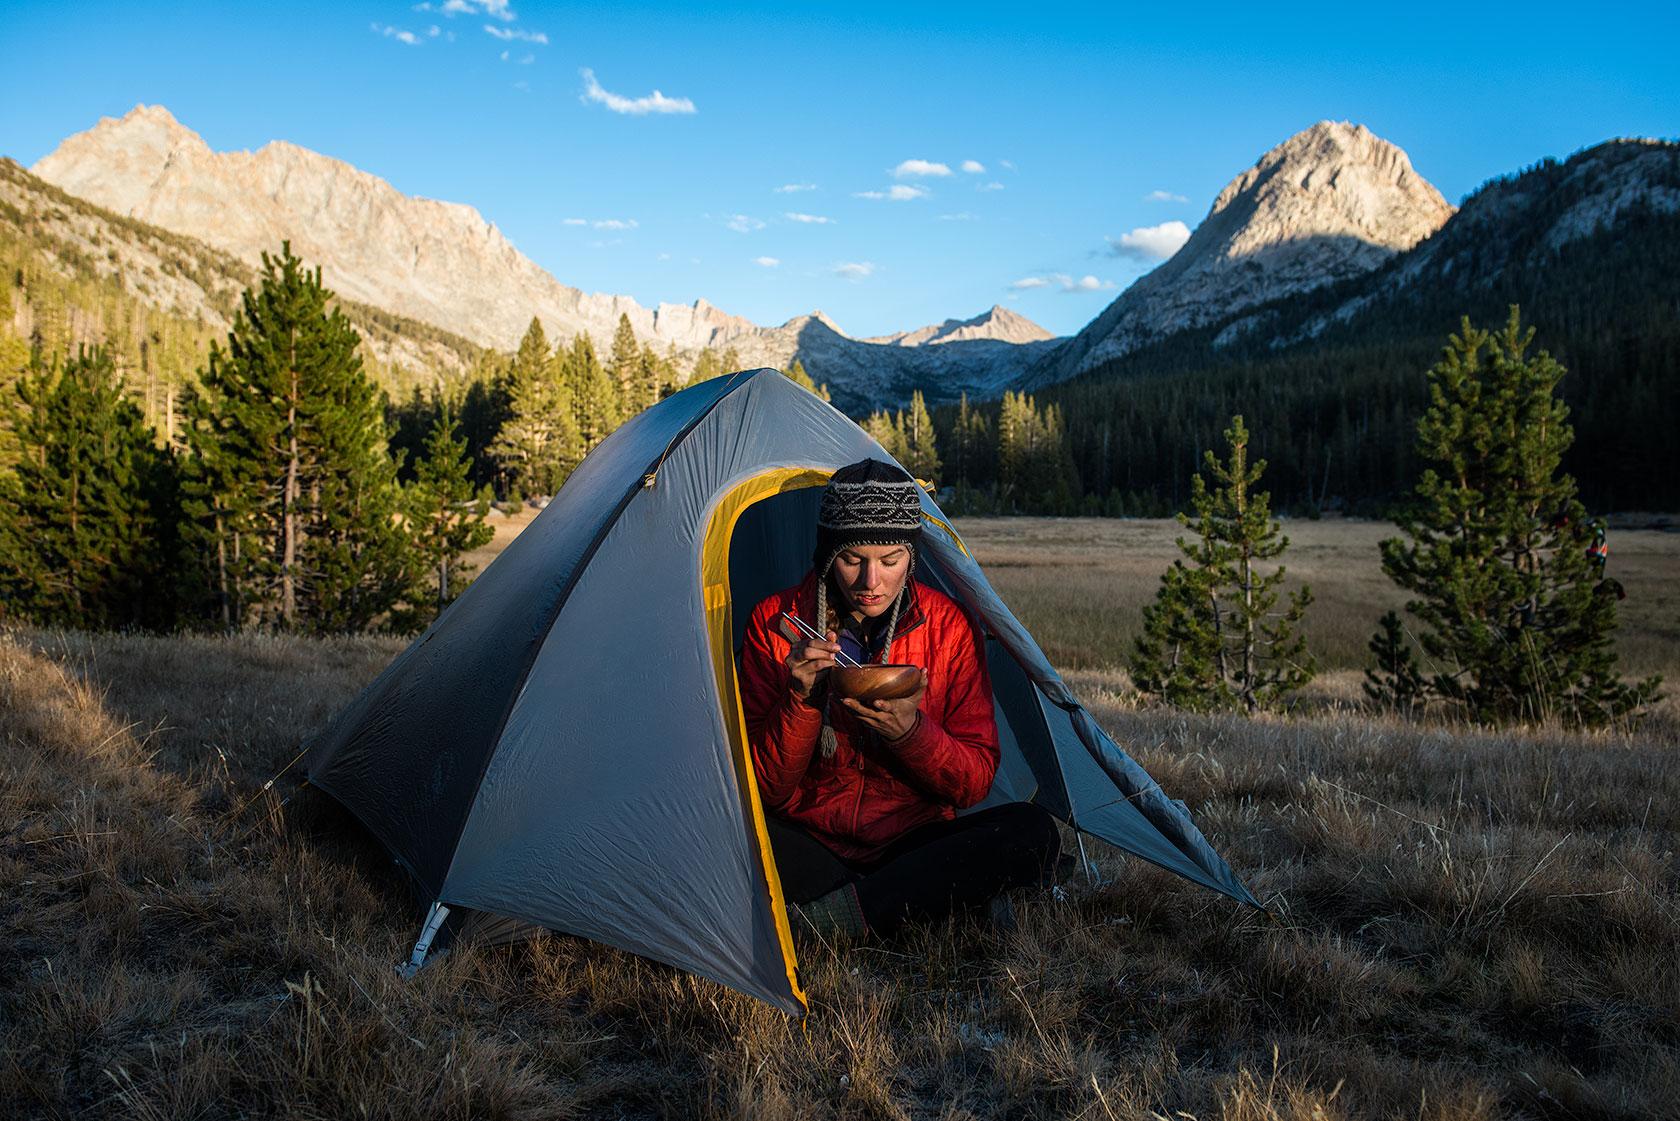 austin-trigg-big-agnes-tent-john-muir-trail-camping-sunset-Sunlight-Evolution-Valley.jpg